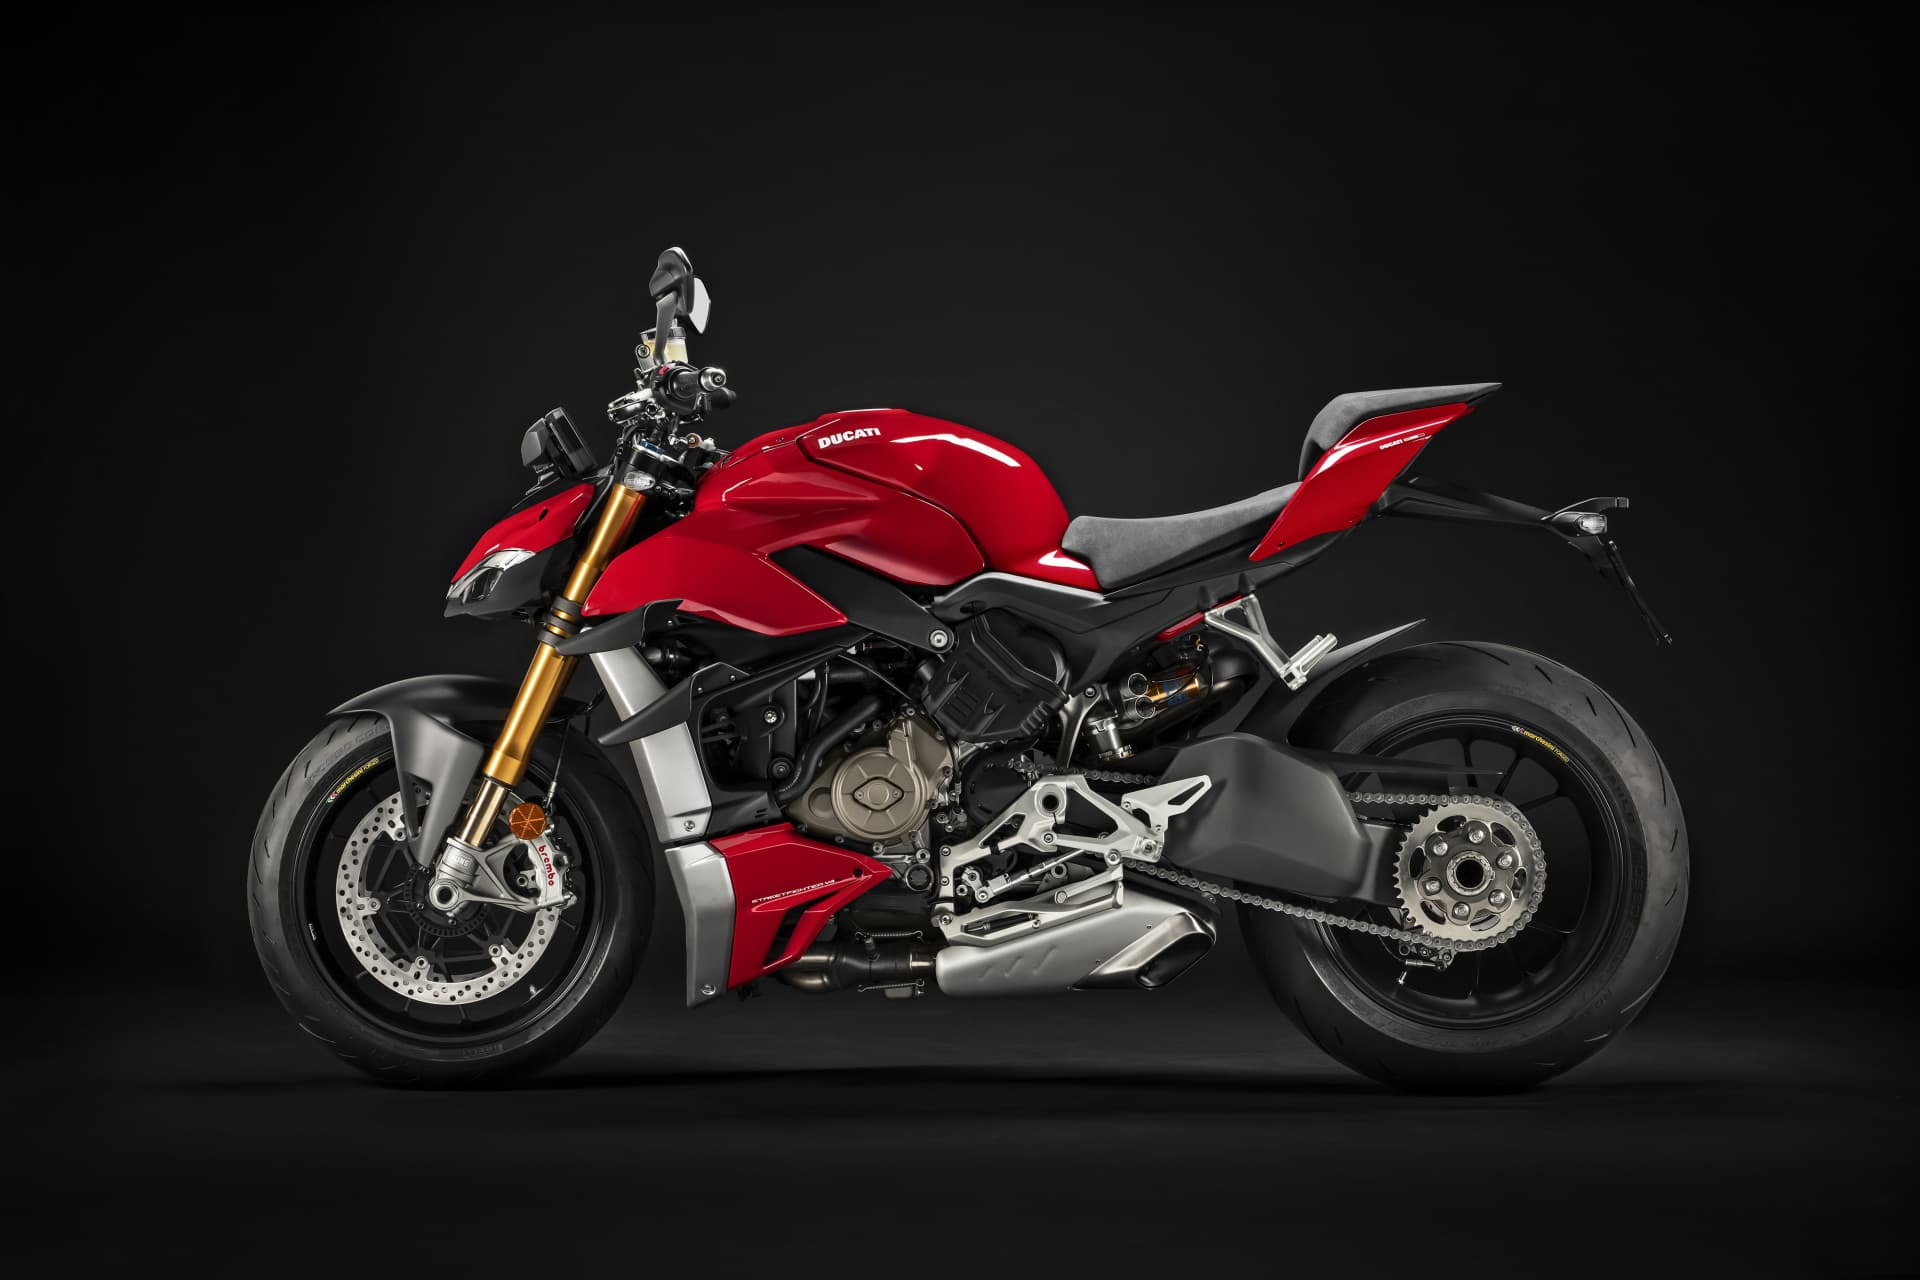 My20 Ducati Streetfigher V4 S 04 Uc101687 Mid